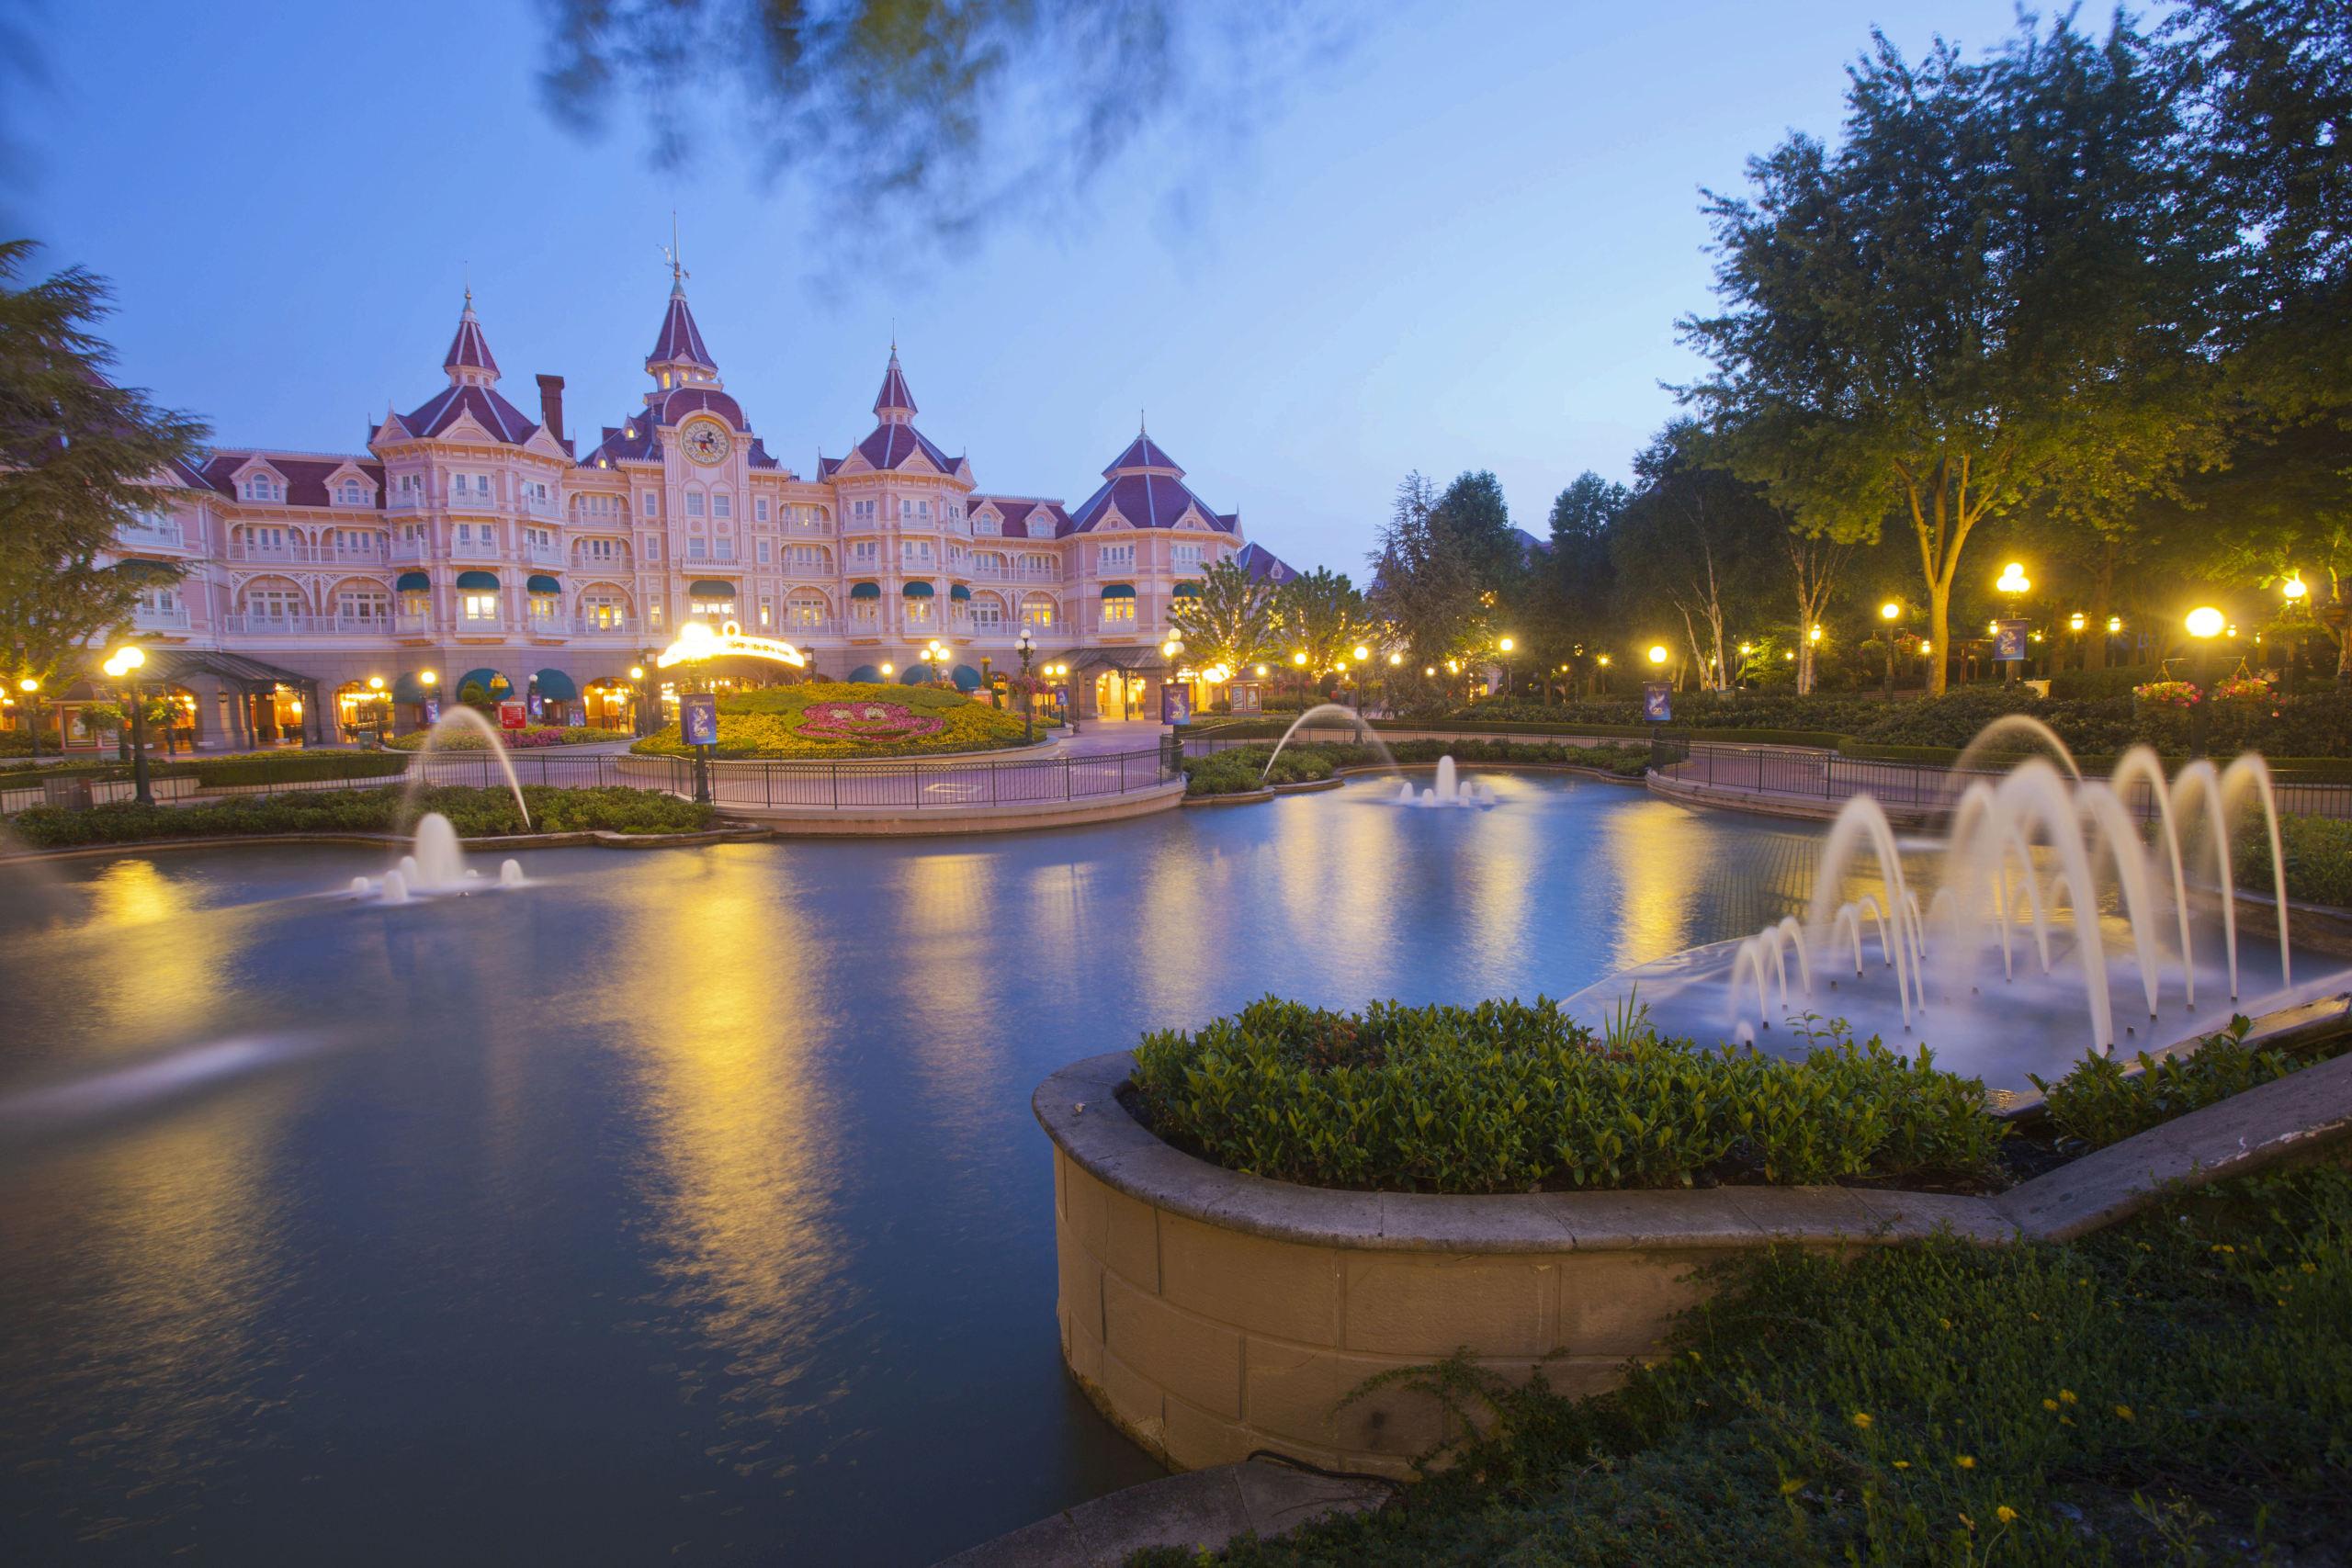 Riapertura di Disneyland Paris - Pagina 2 Disney41